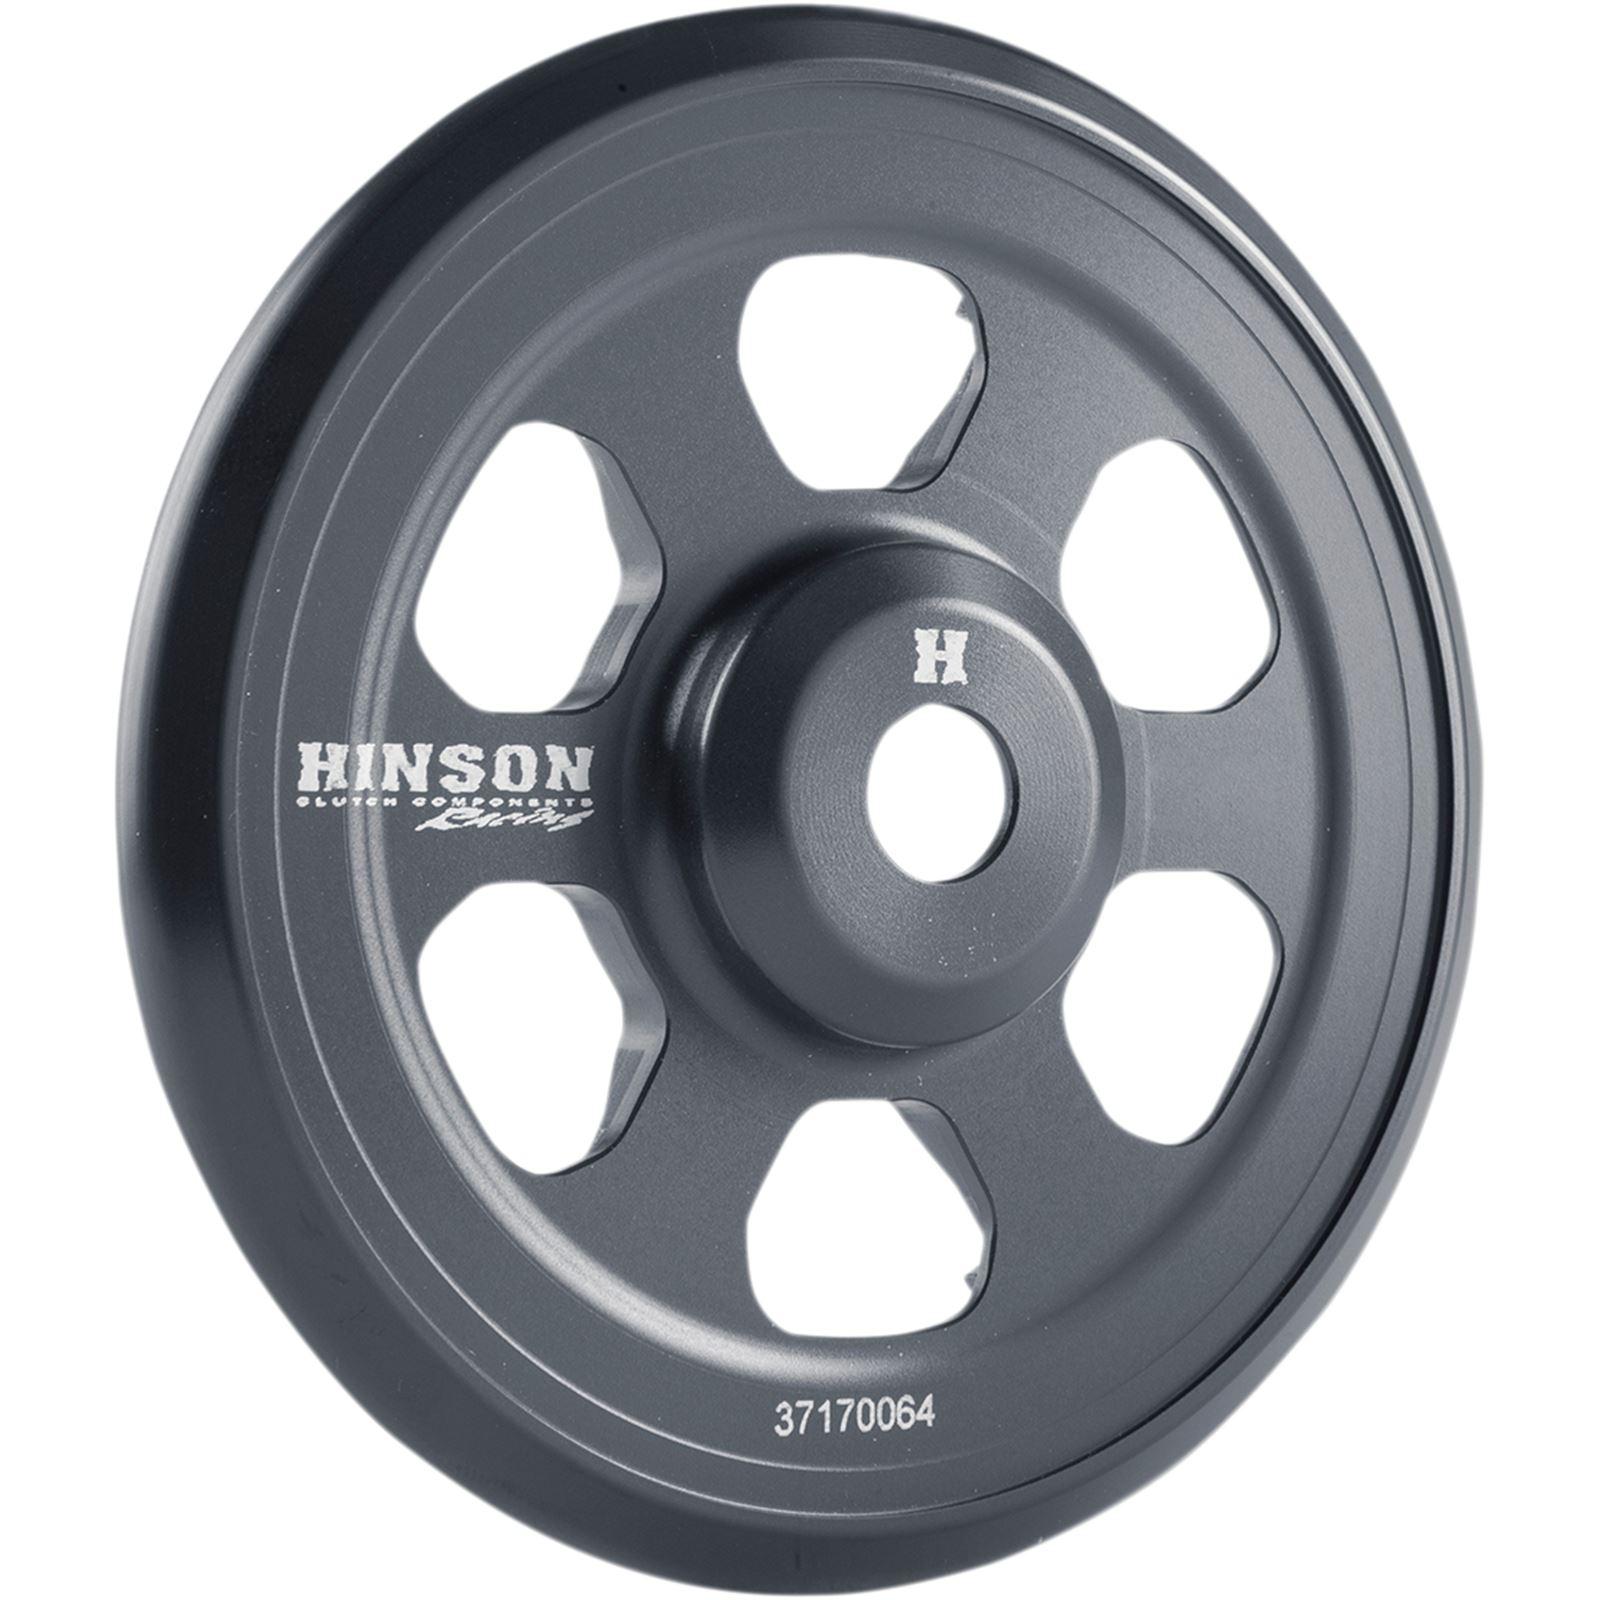 Hinson Pressure Plate Kit